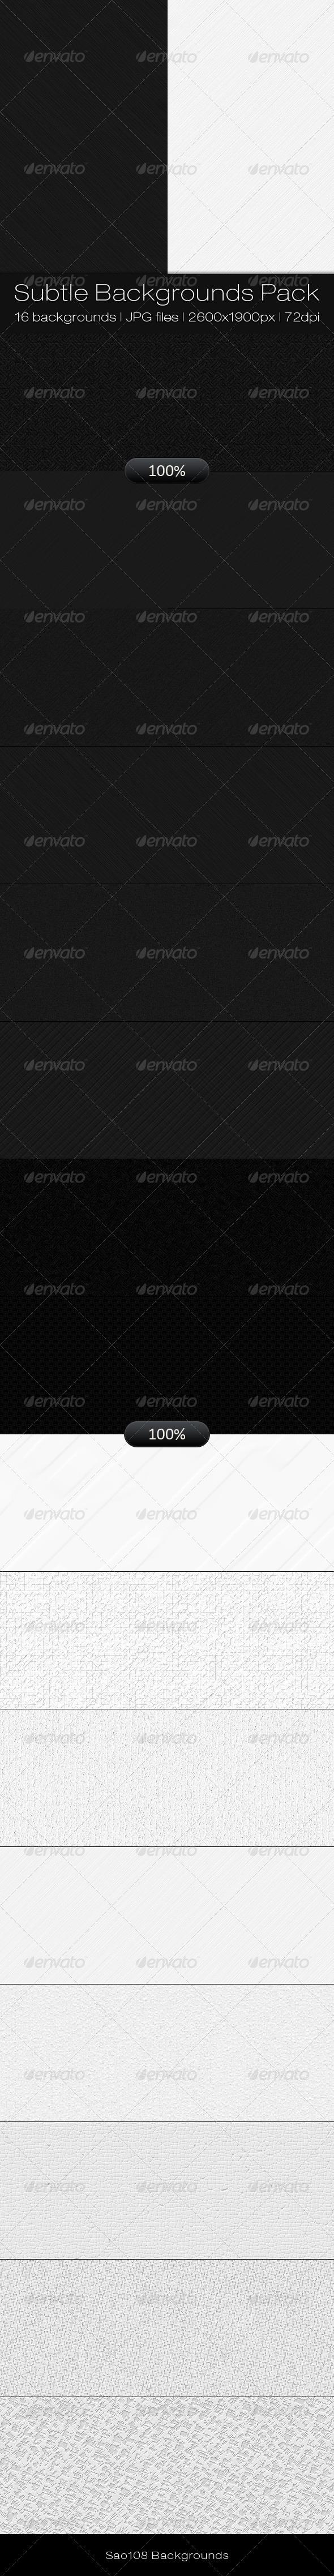 GraphicRiver Subtle Backgrounds Pack 3551262